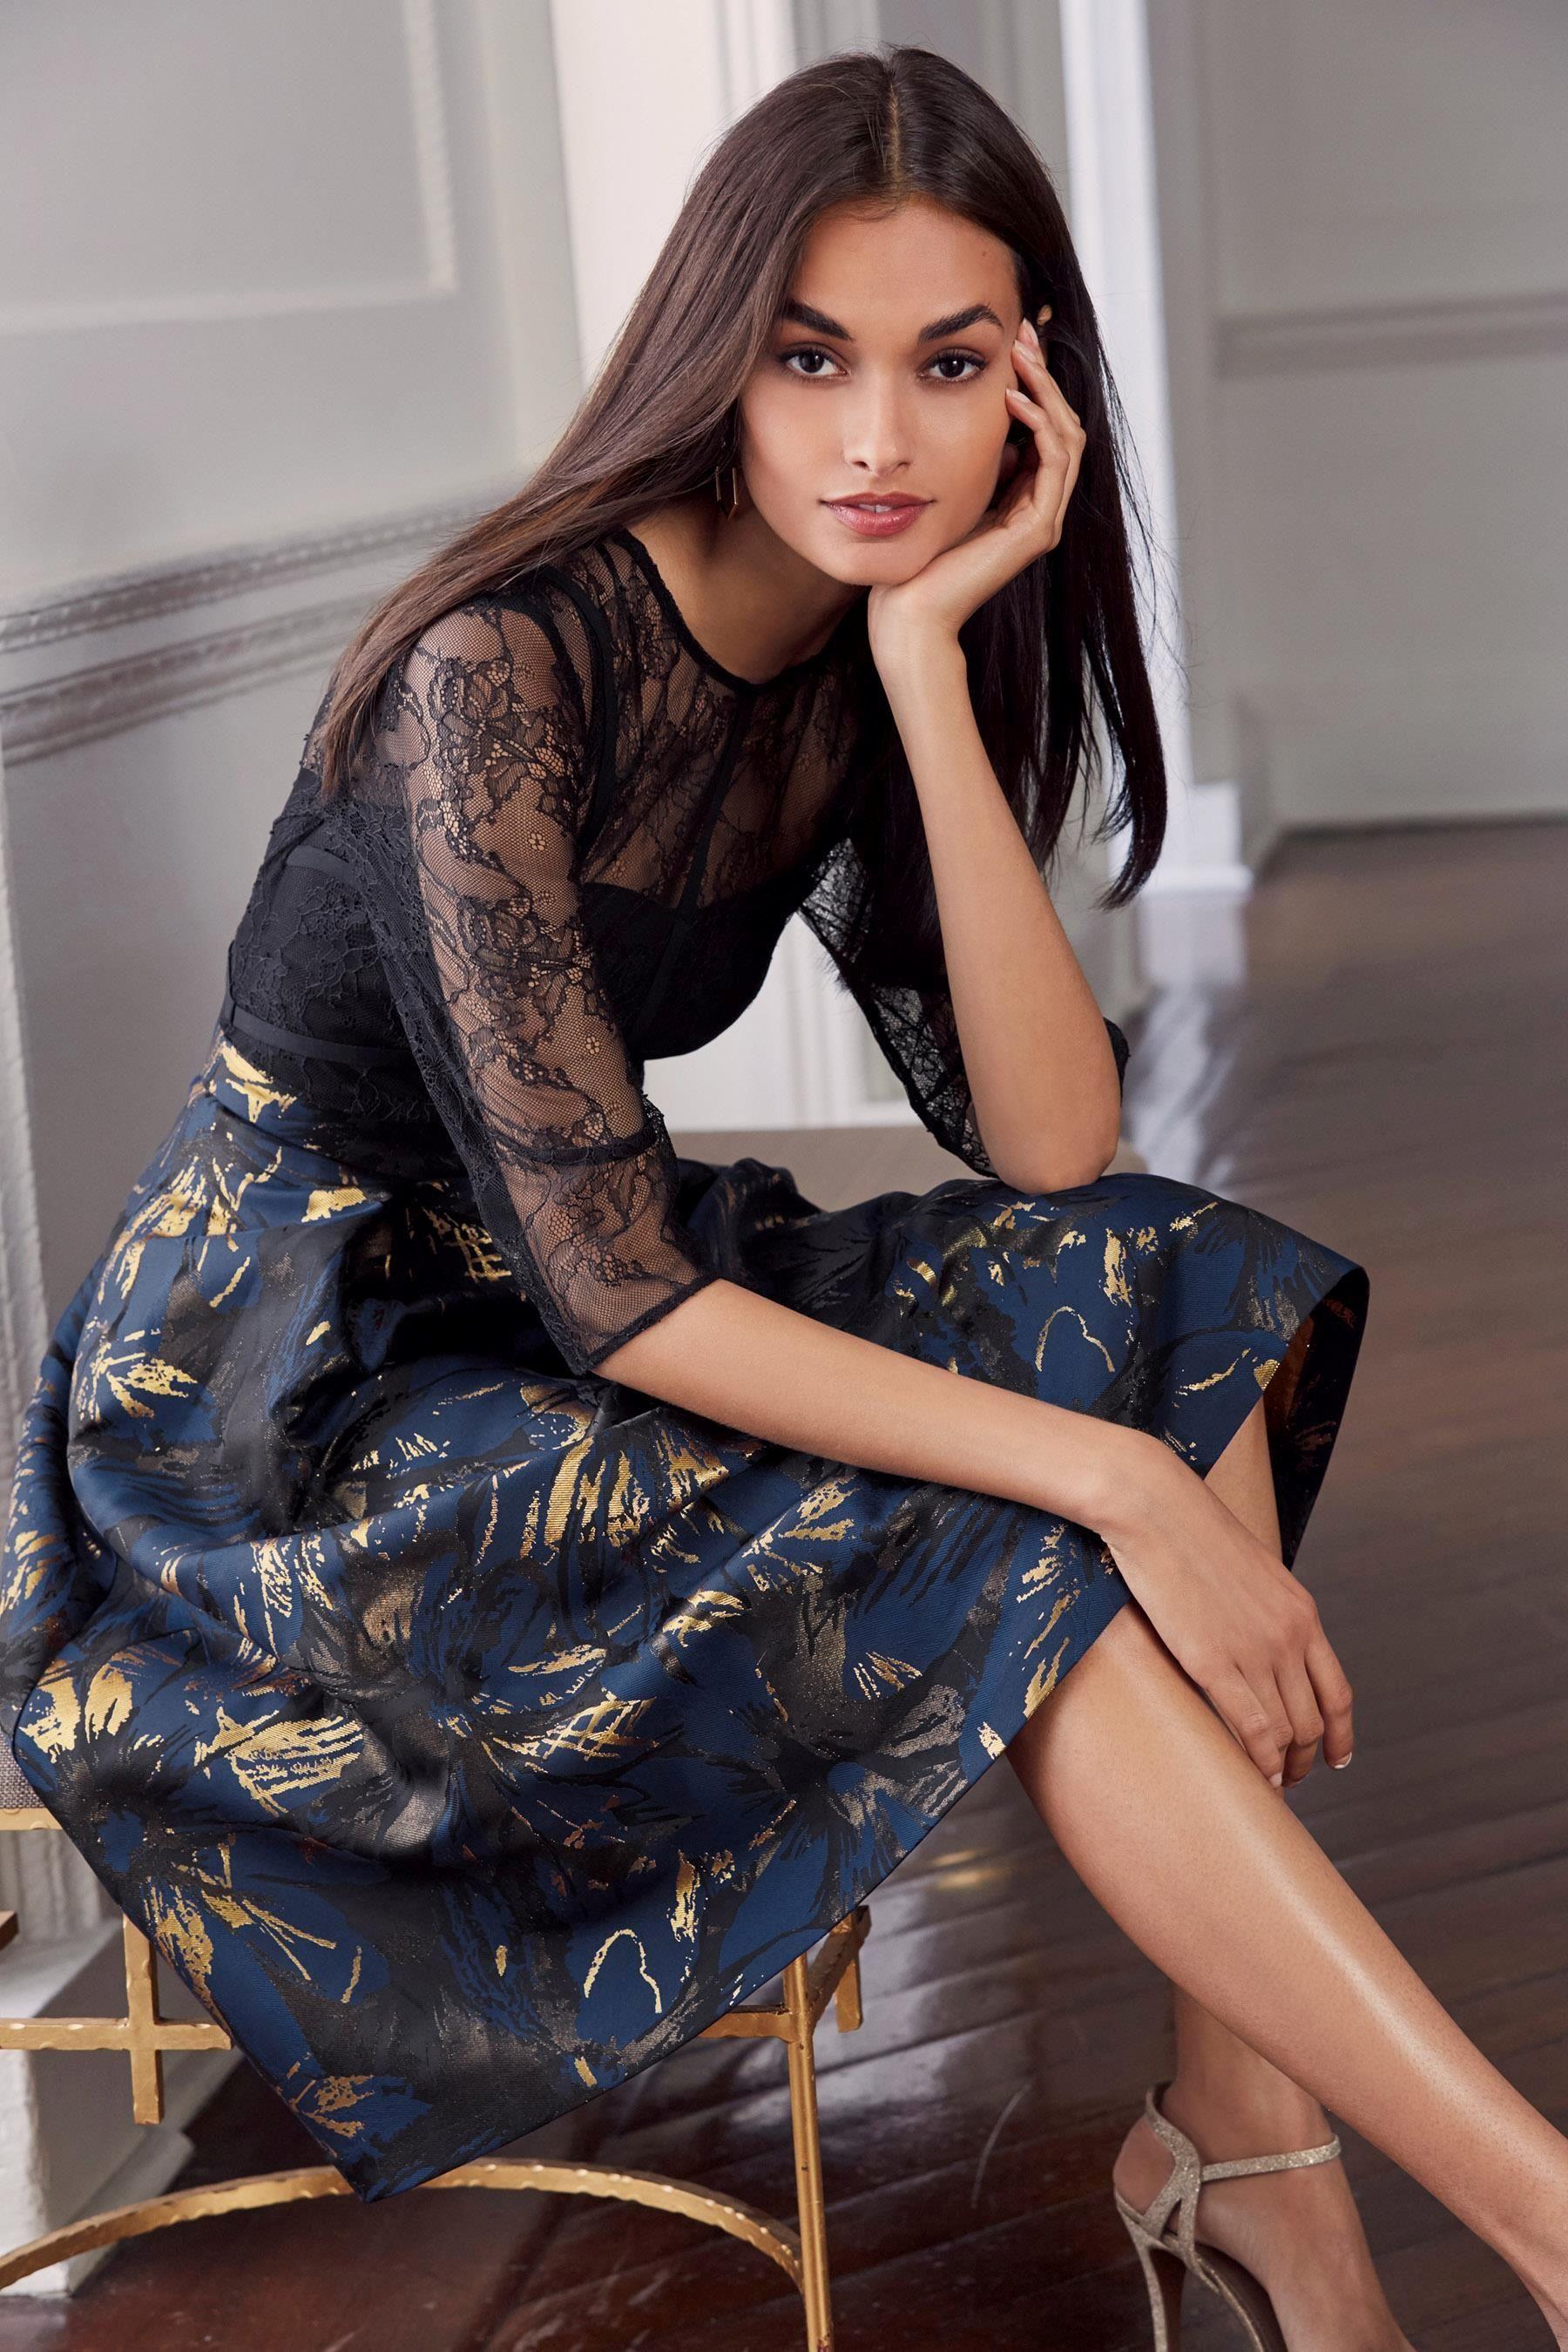 983b2376cc0 Buy Blue Black Jacquard Prom Dress from the Next UK online shop ...